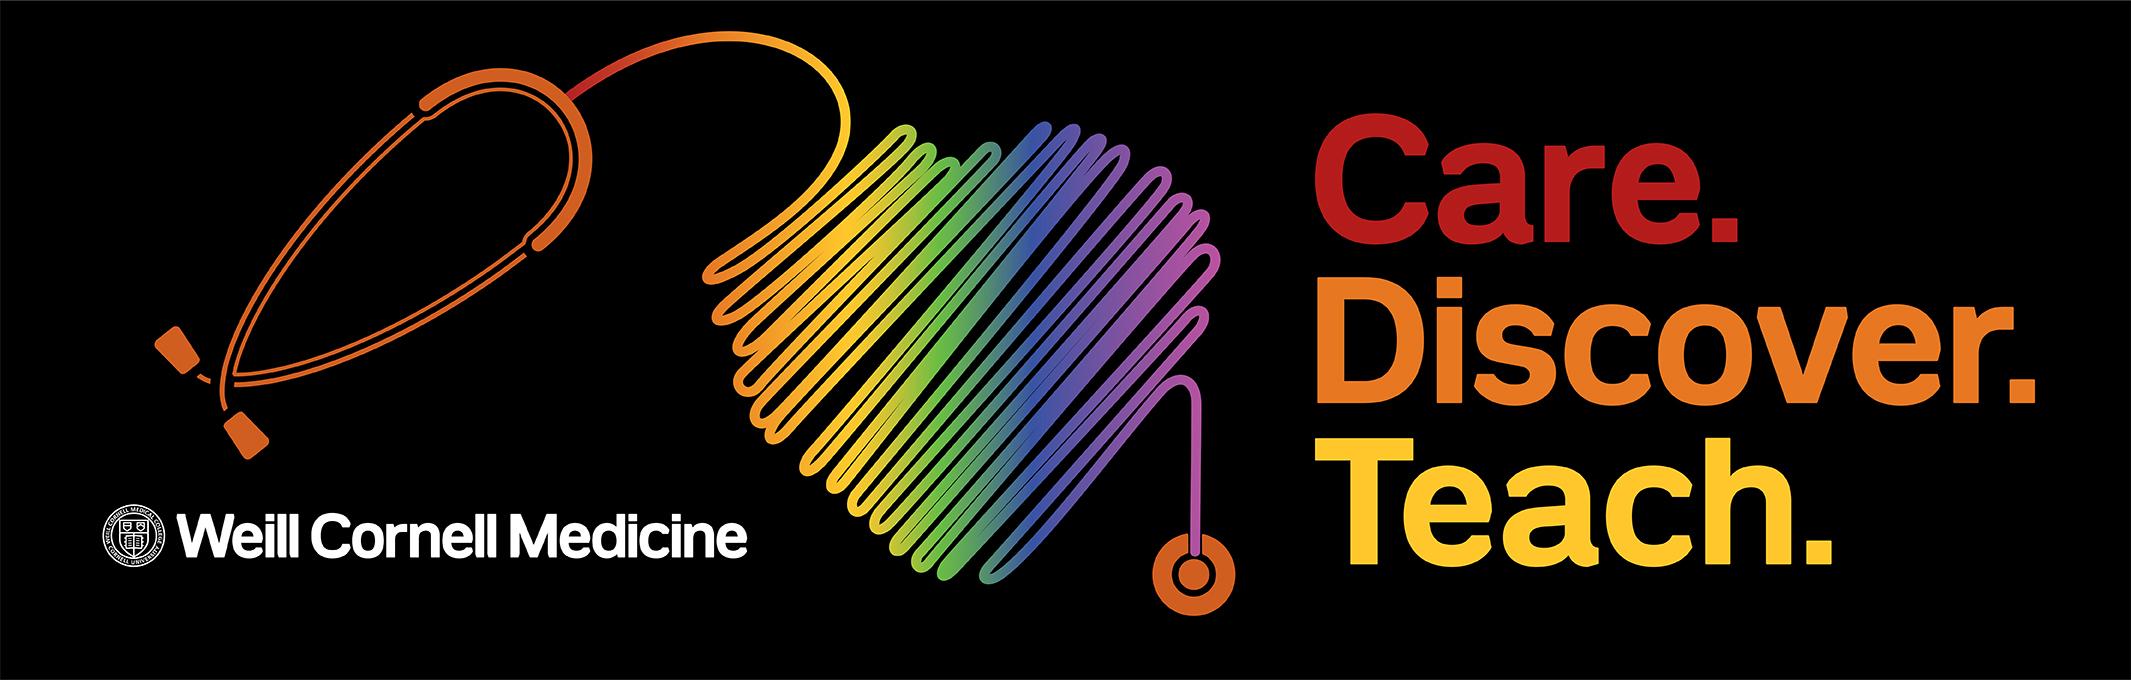 wcm pride logo 2020